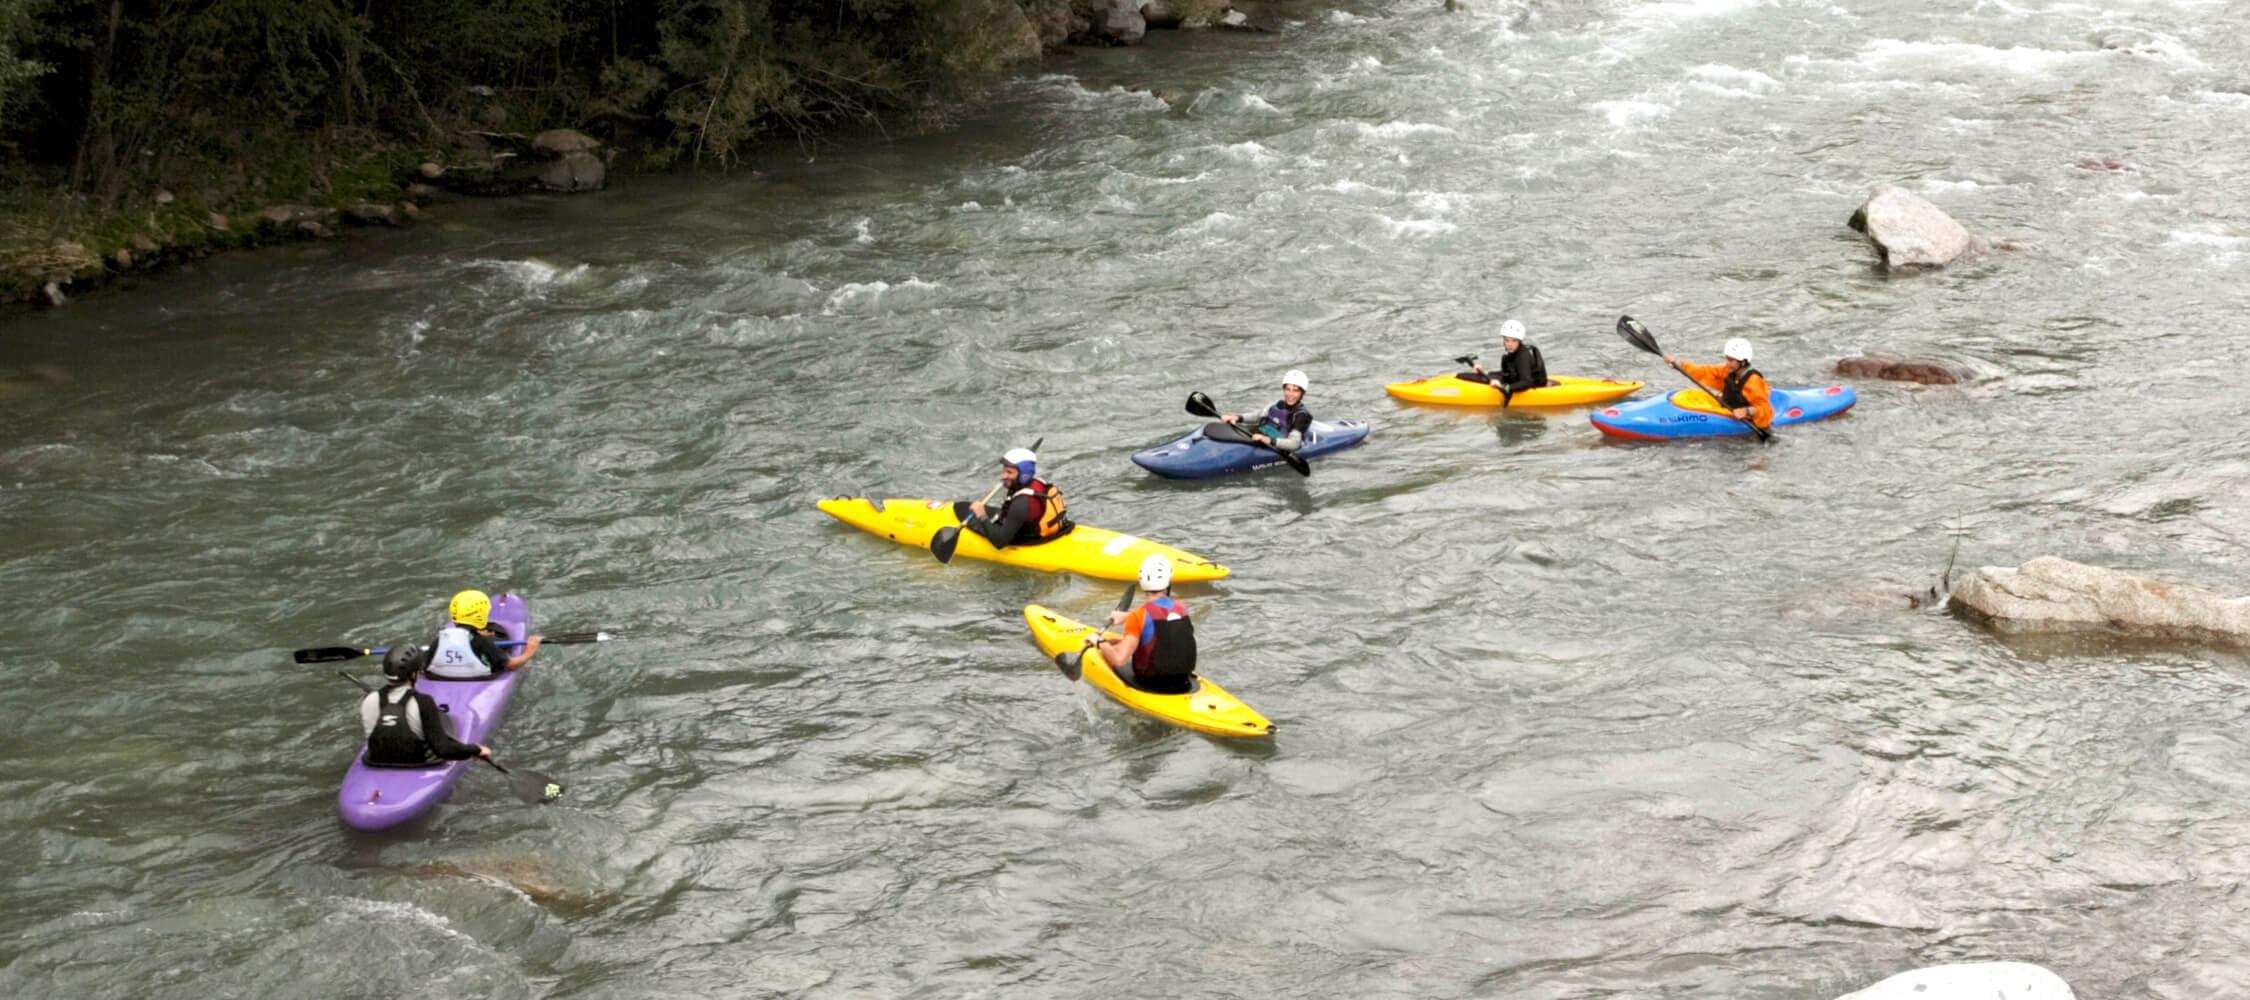 Italien-Trentino_Suedtirol_Alto_Adige_Merano_Meran_Natur_Sport_Sommer_Kanu_Wasser_Passer_MGM-Frieder-Blickle_mgm00188frbl_2250x1000